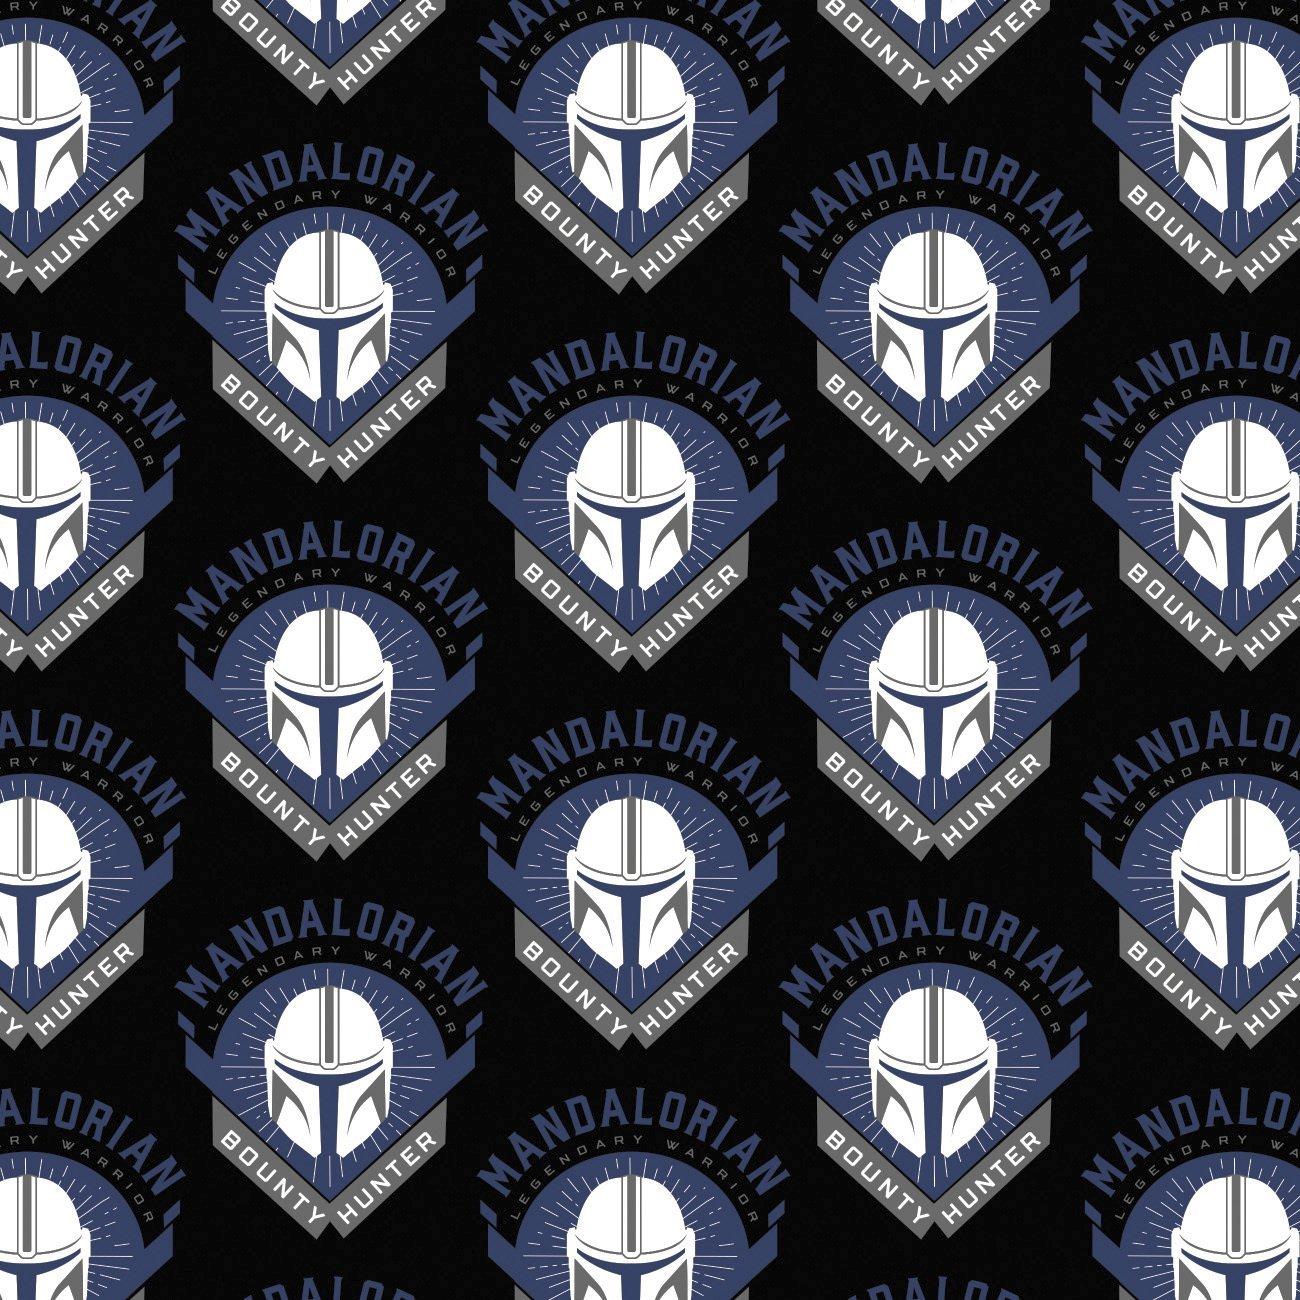 Mandelorian Fabric Legendary Warrior FLANNEL